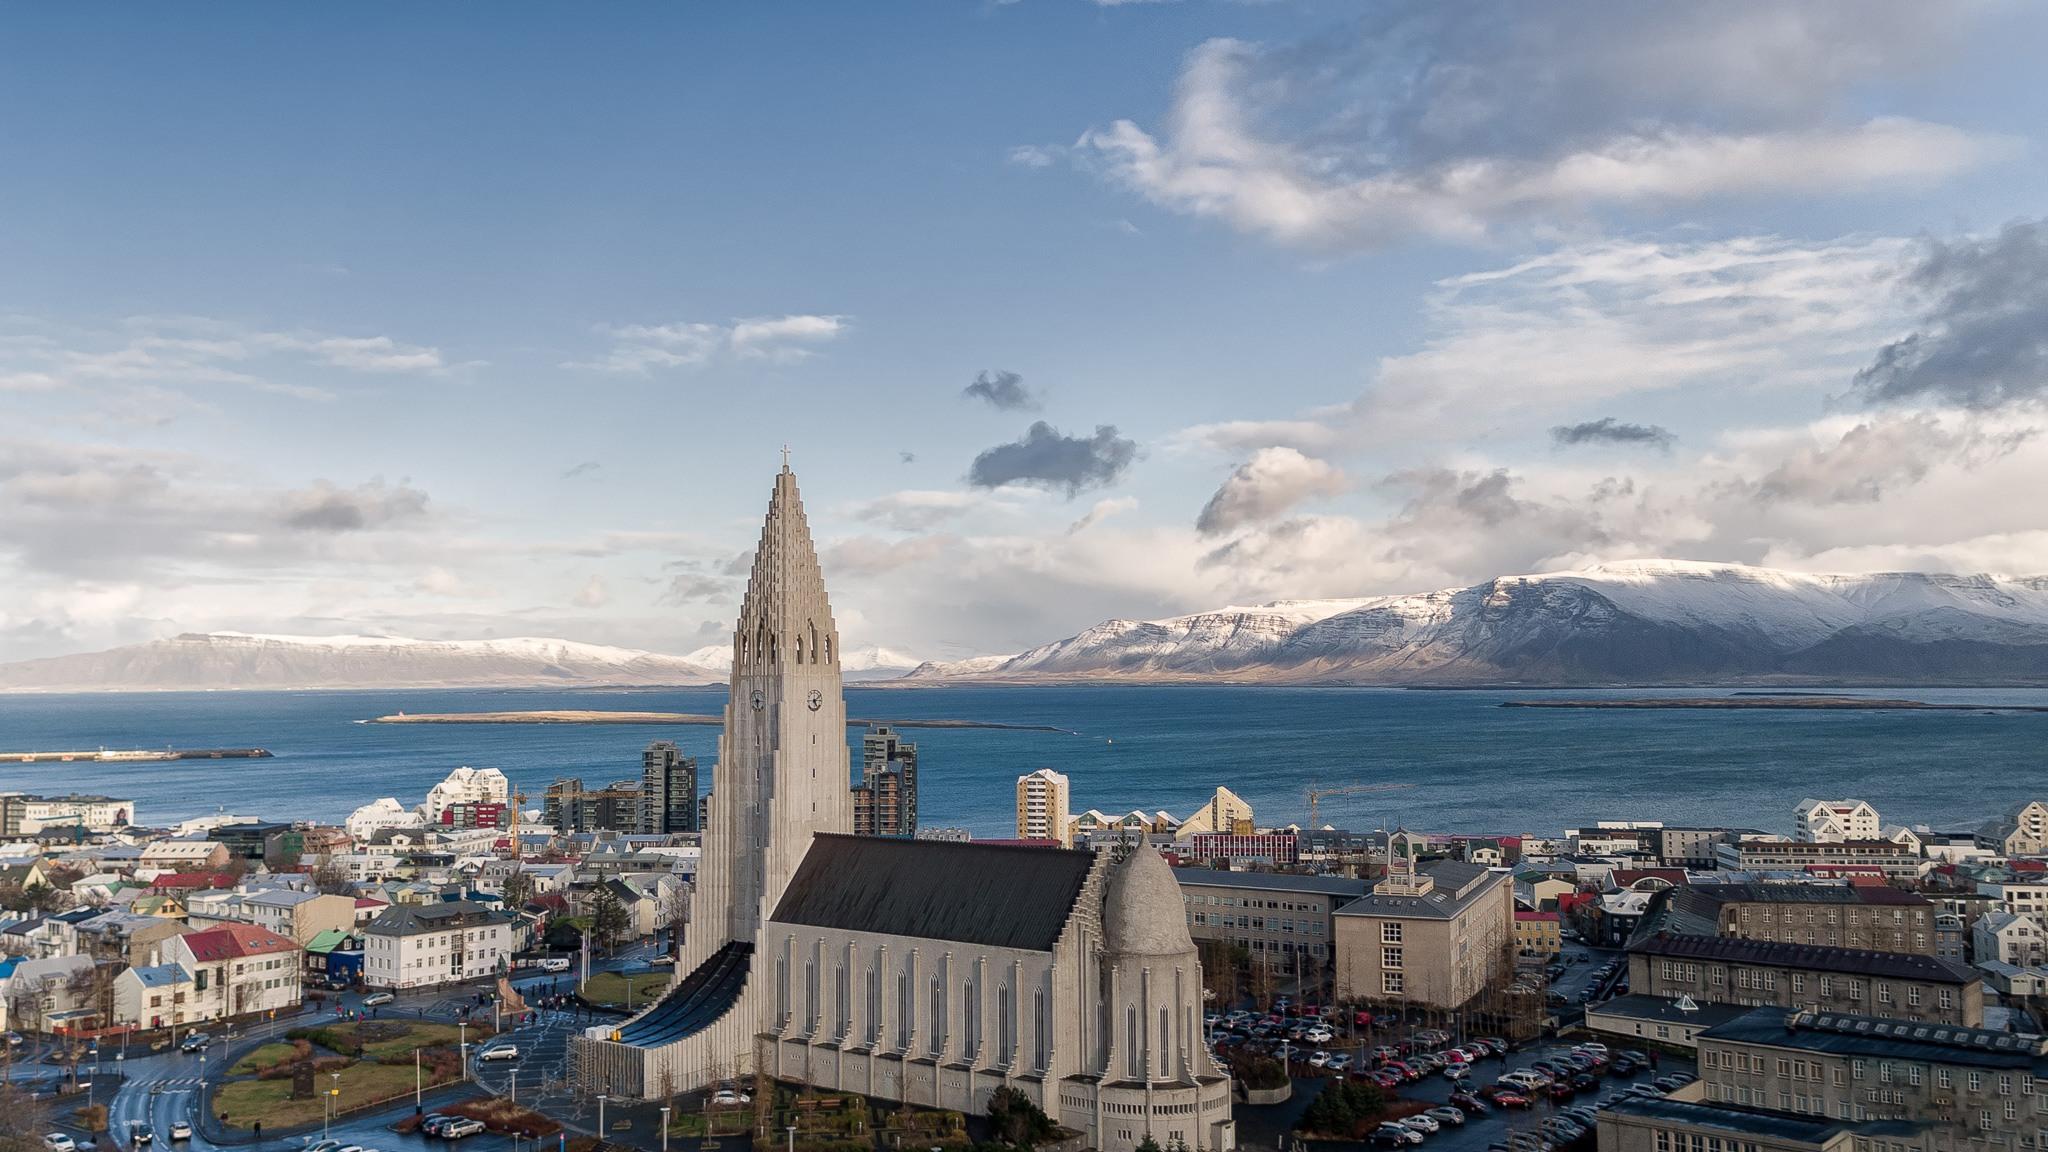 City of Reykjavik-Hallgrimskirkja